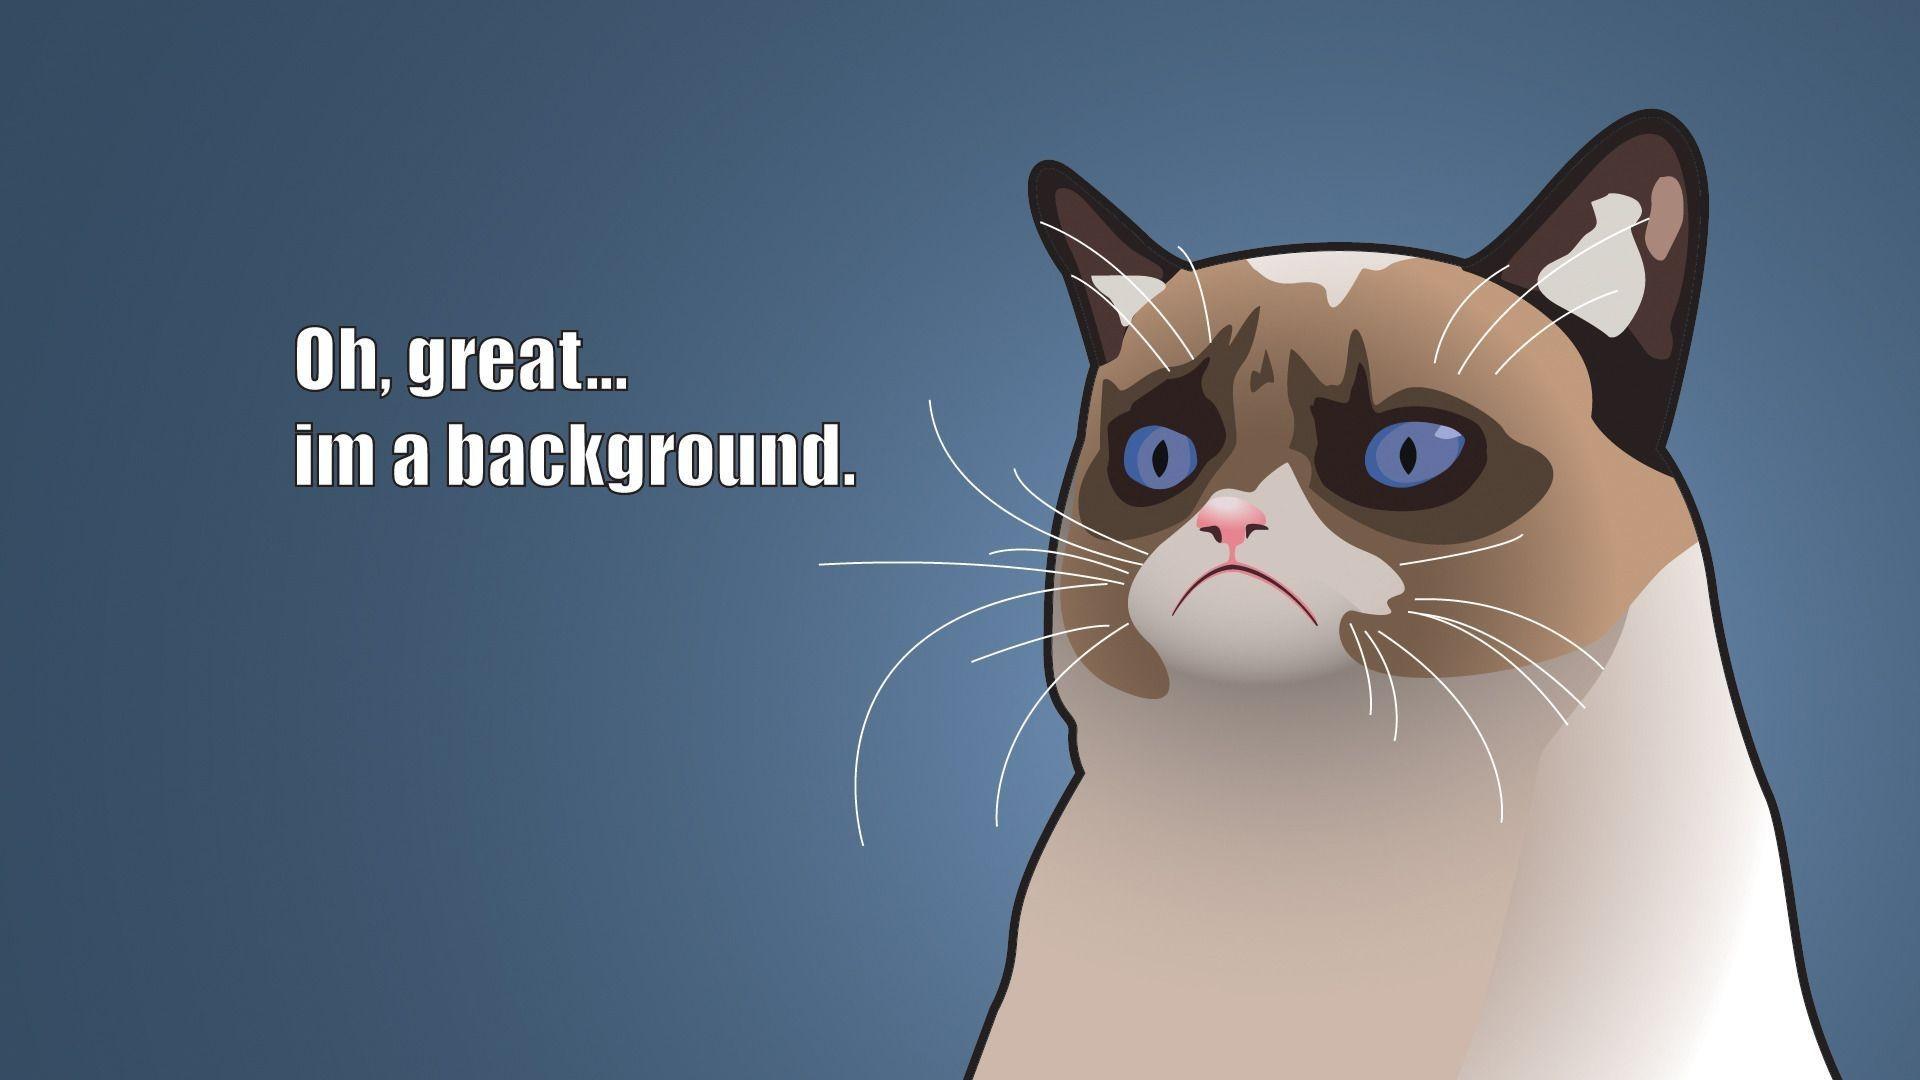 Angry Cat Funny Meme Wallpaper HD